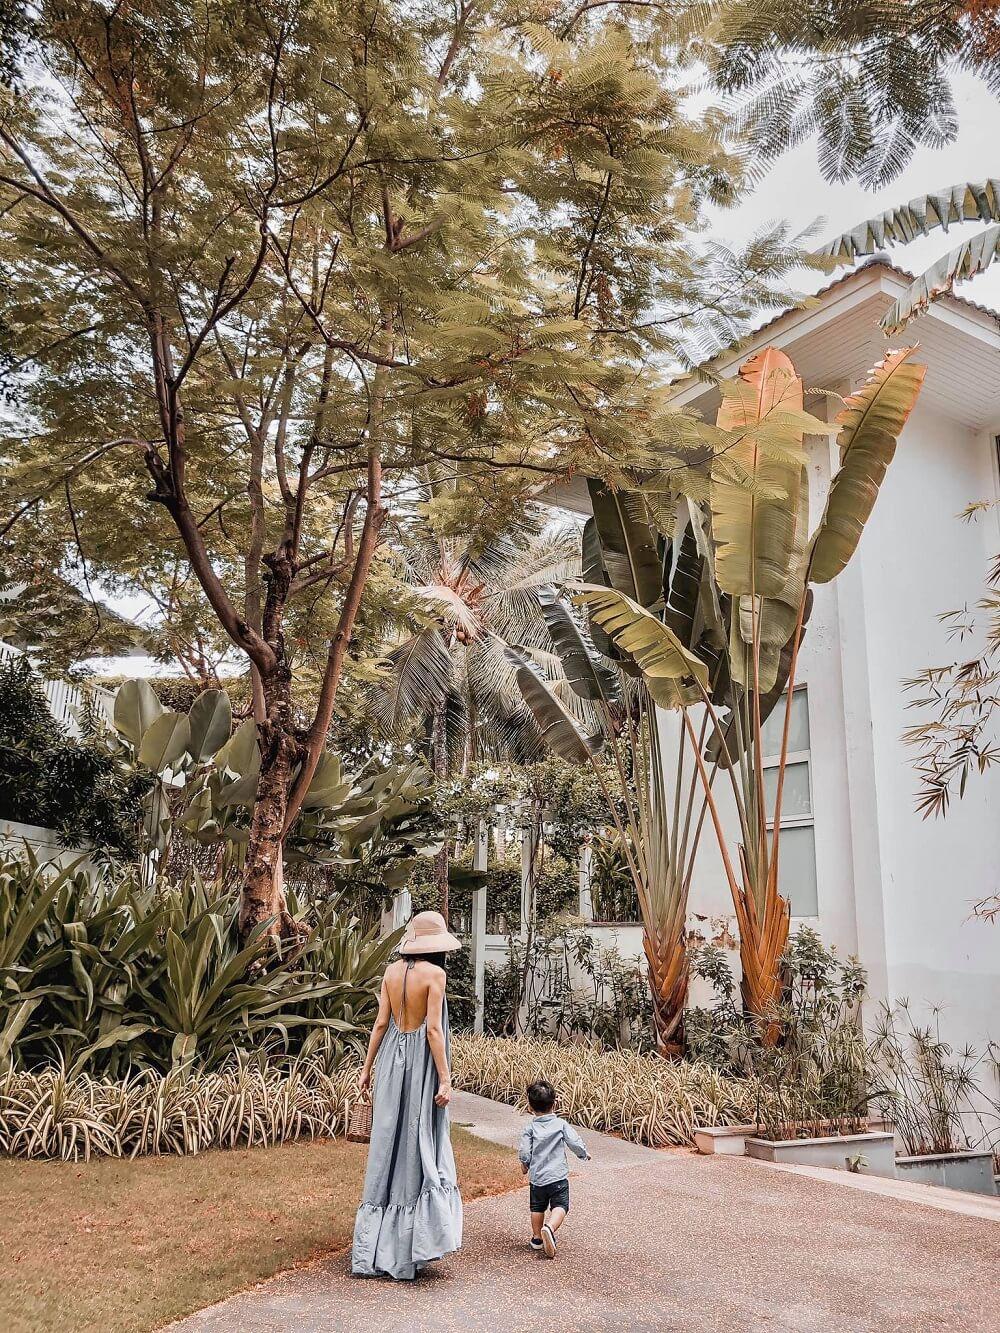 Premier Village Danang Resort Managed By Accorhotels Review Kinh Nghiem Du Lich Da Nang Cho Gia Dinh Co Con Nho Danang Fantasticity Com 018